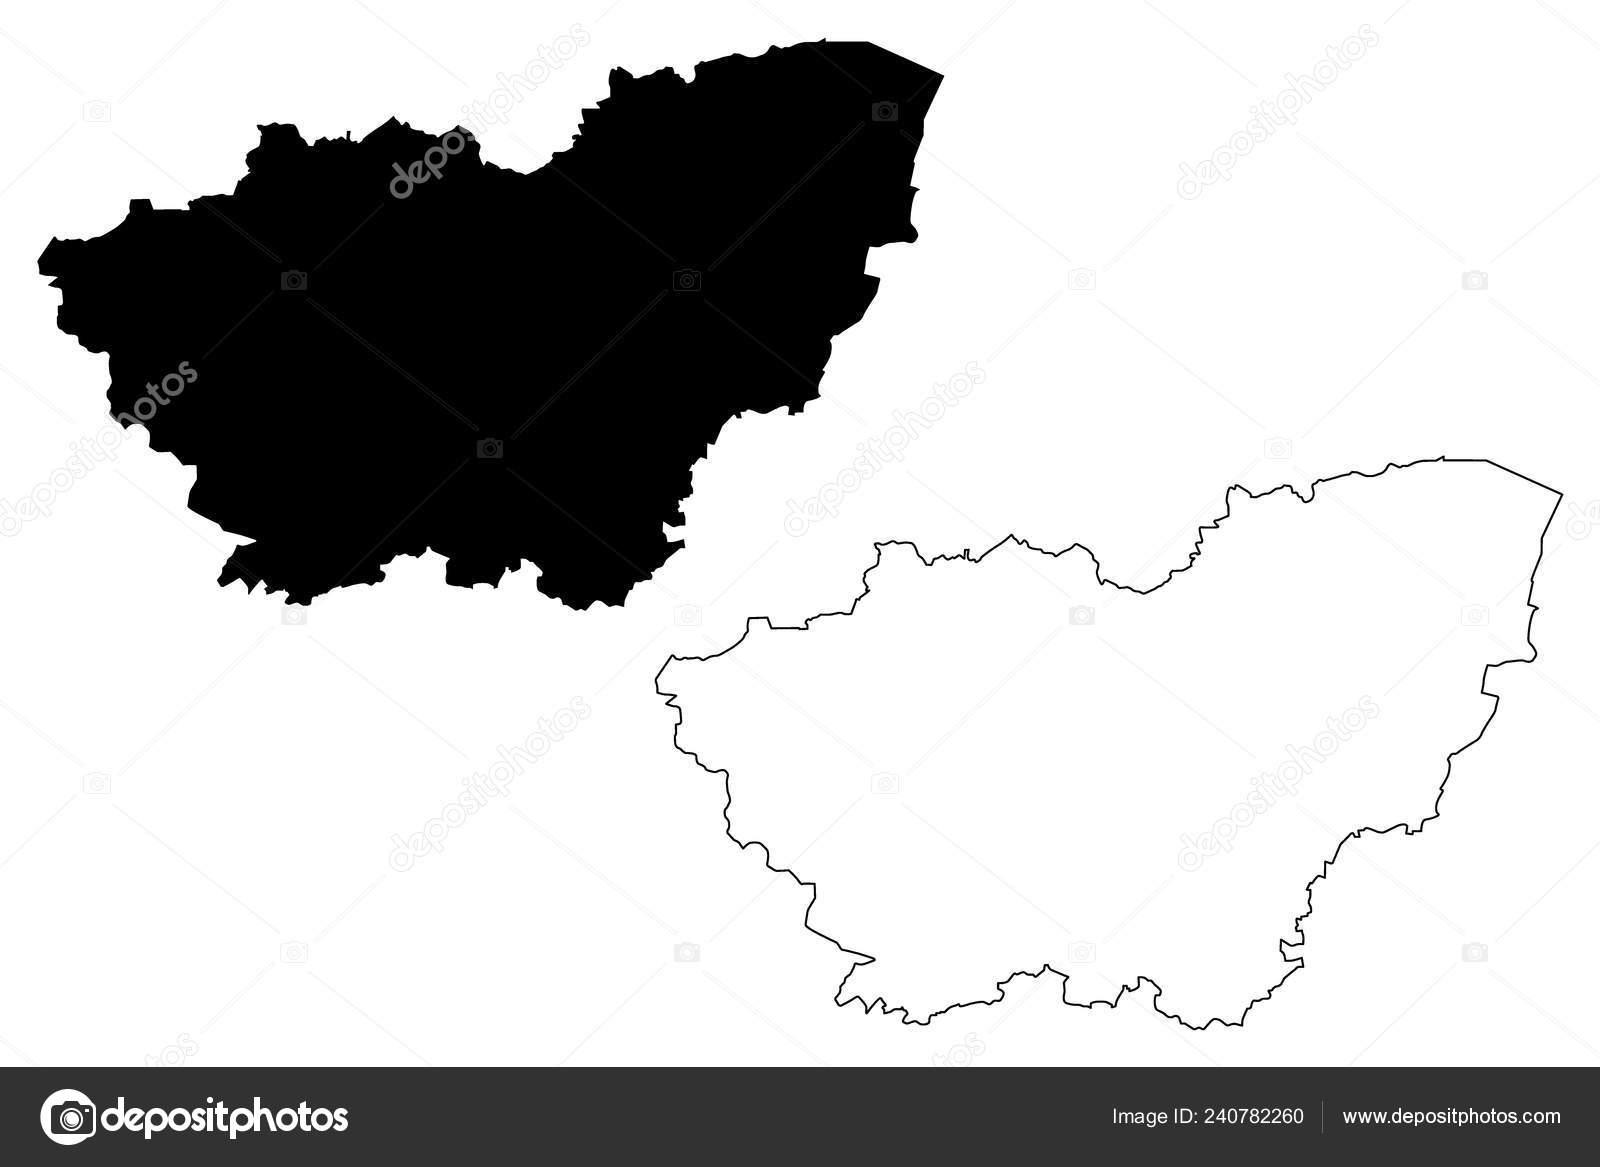 South Yorkshire United Kingdom England Metropolitan County Map ... on hartlepool england map, south downs england map, north yorkshire map, north yorkshire, uk england road map, york england map, sussex england map, scotland map, west yorkshire, rome england map, united kingdom map, trowbridge england map, glossop england map, hampshire england map, wales map, st bees england map, derbyshire england map, london england map, lincolnshire map, horley england map, leeds england map, northumberland england map,